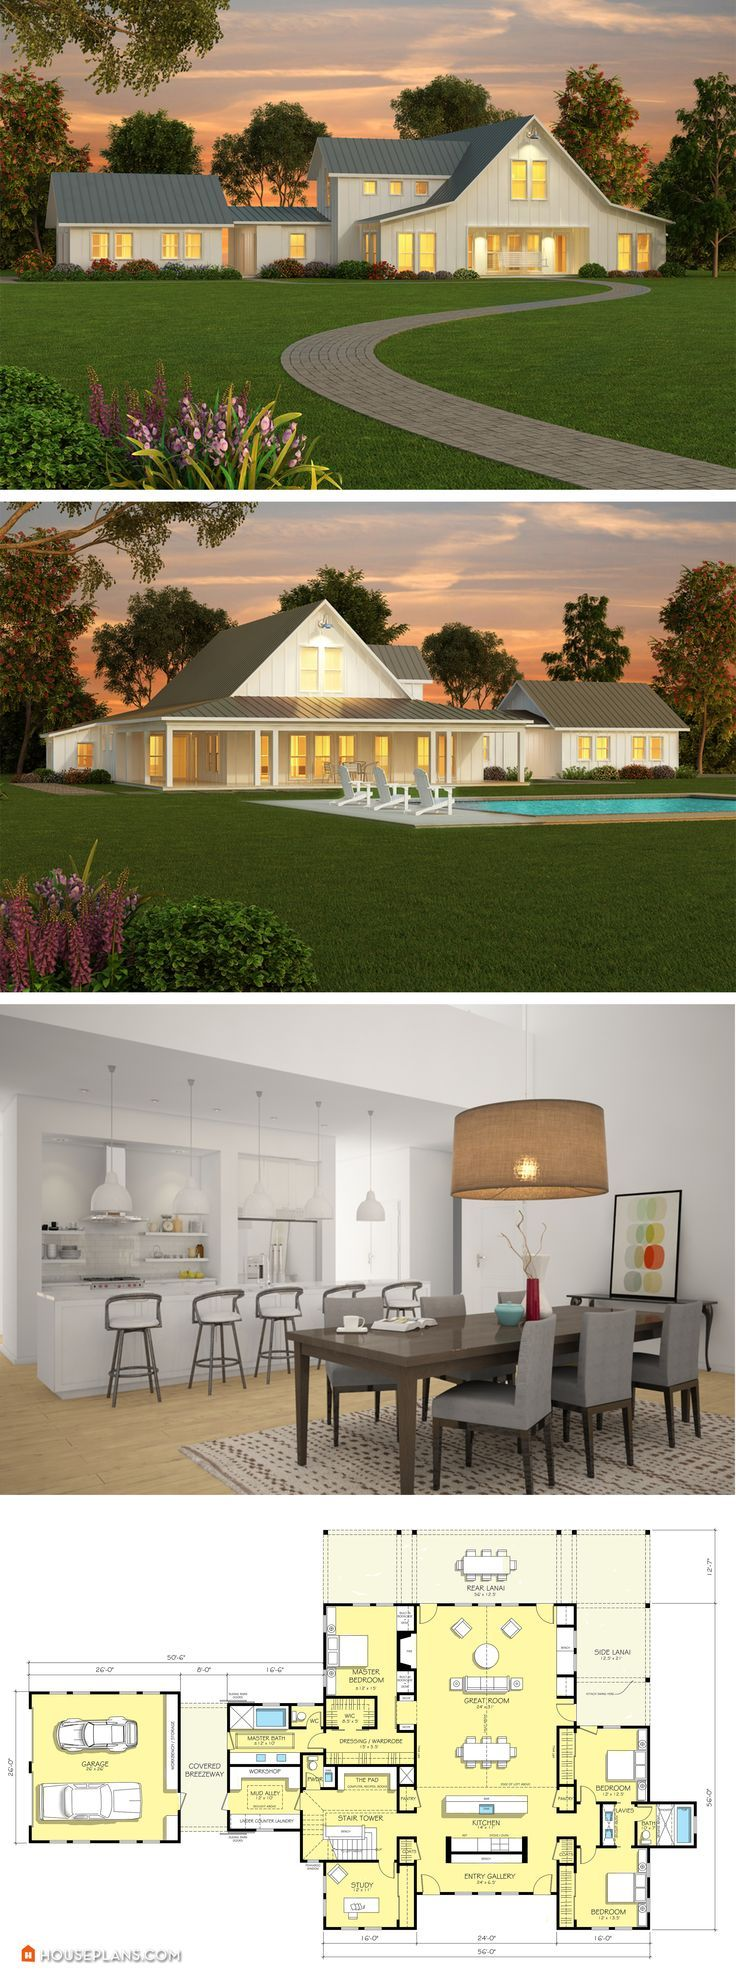 best 25 farmhouse floor plans ideas on pinterest farmhouse house plans farmhouse plans and 4 bedroom house plans